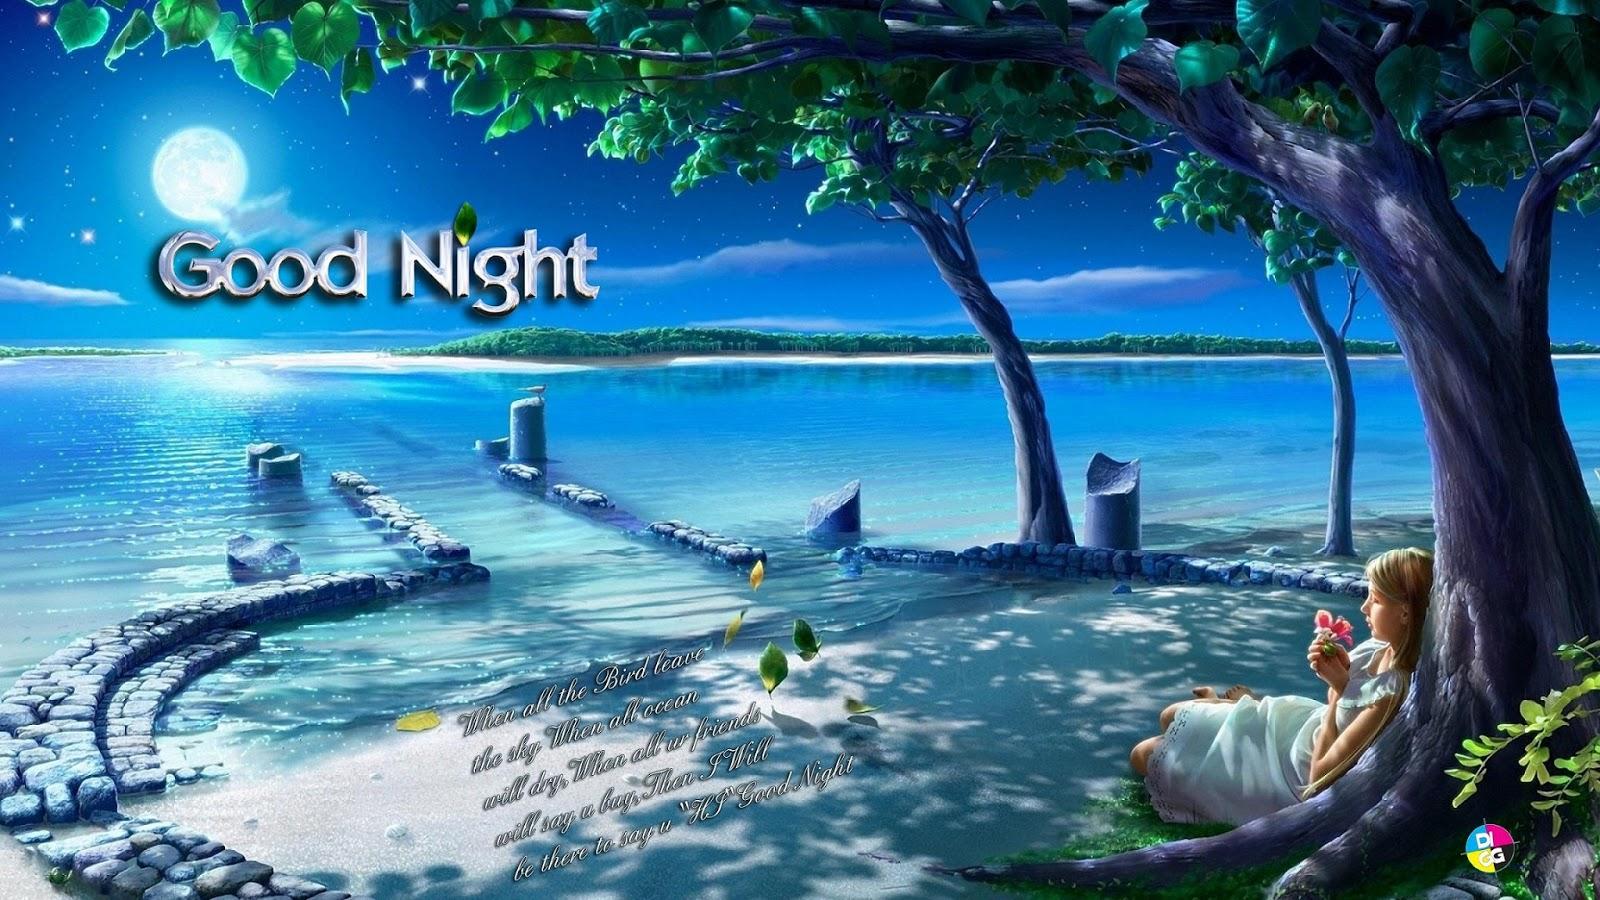 Good Night Pics Gud Nyt Wallpapers Wish Sms Jobspapacom | Auto Design ...